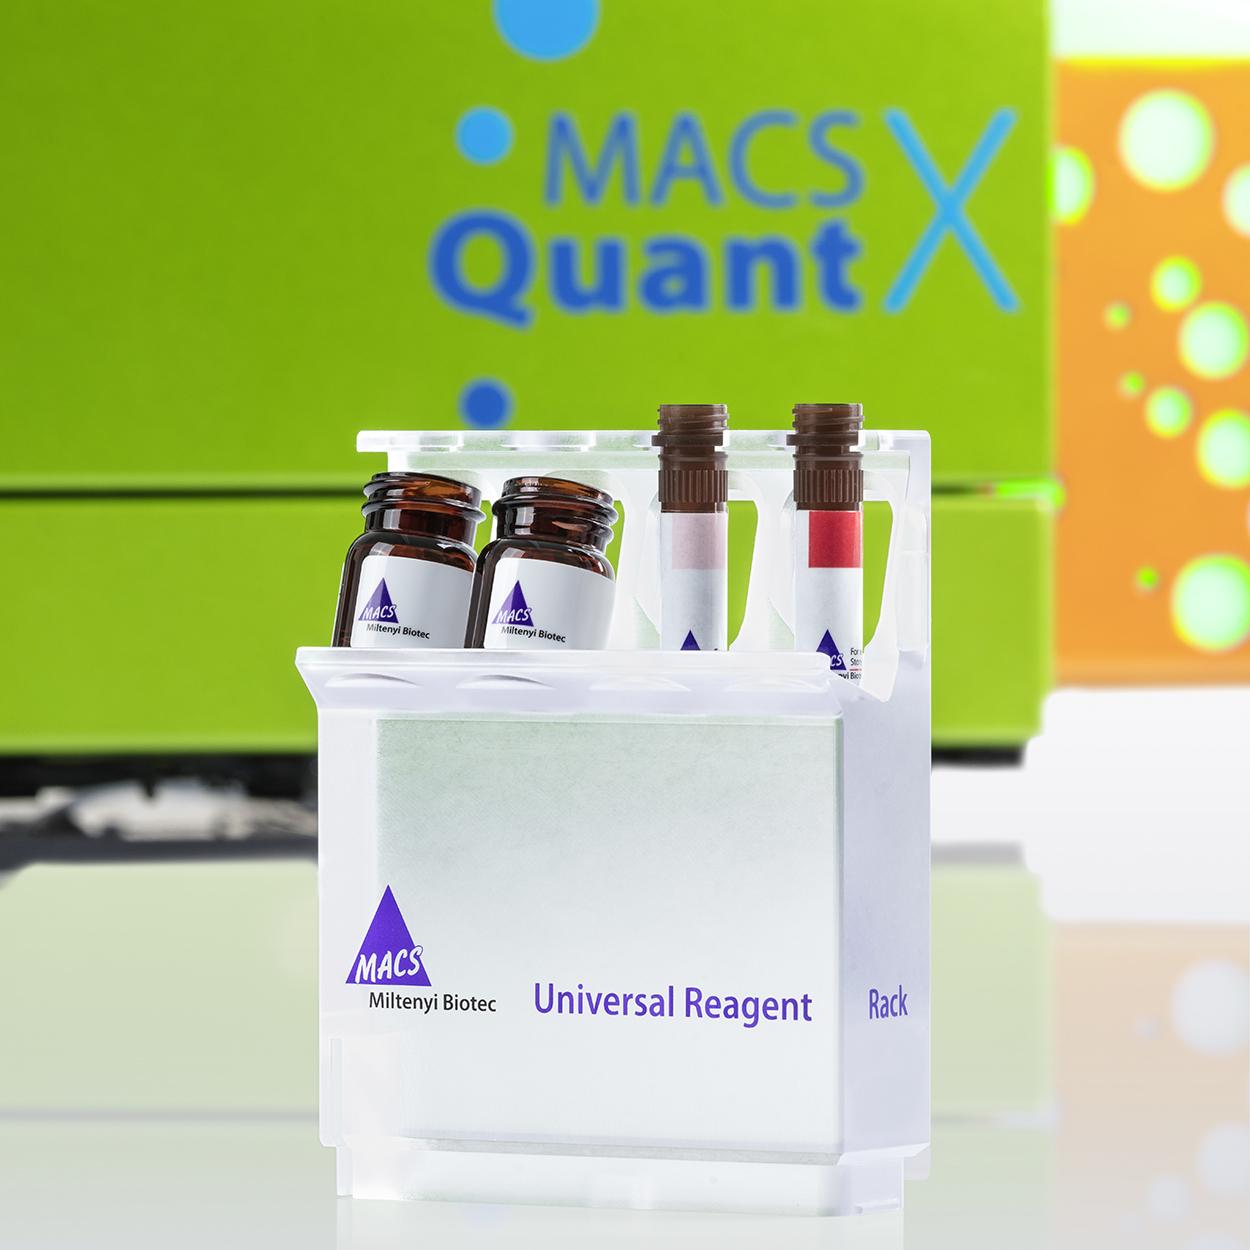 Universal Reagent Rack